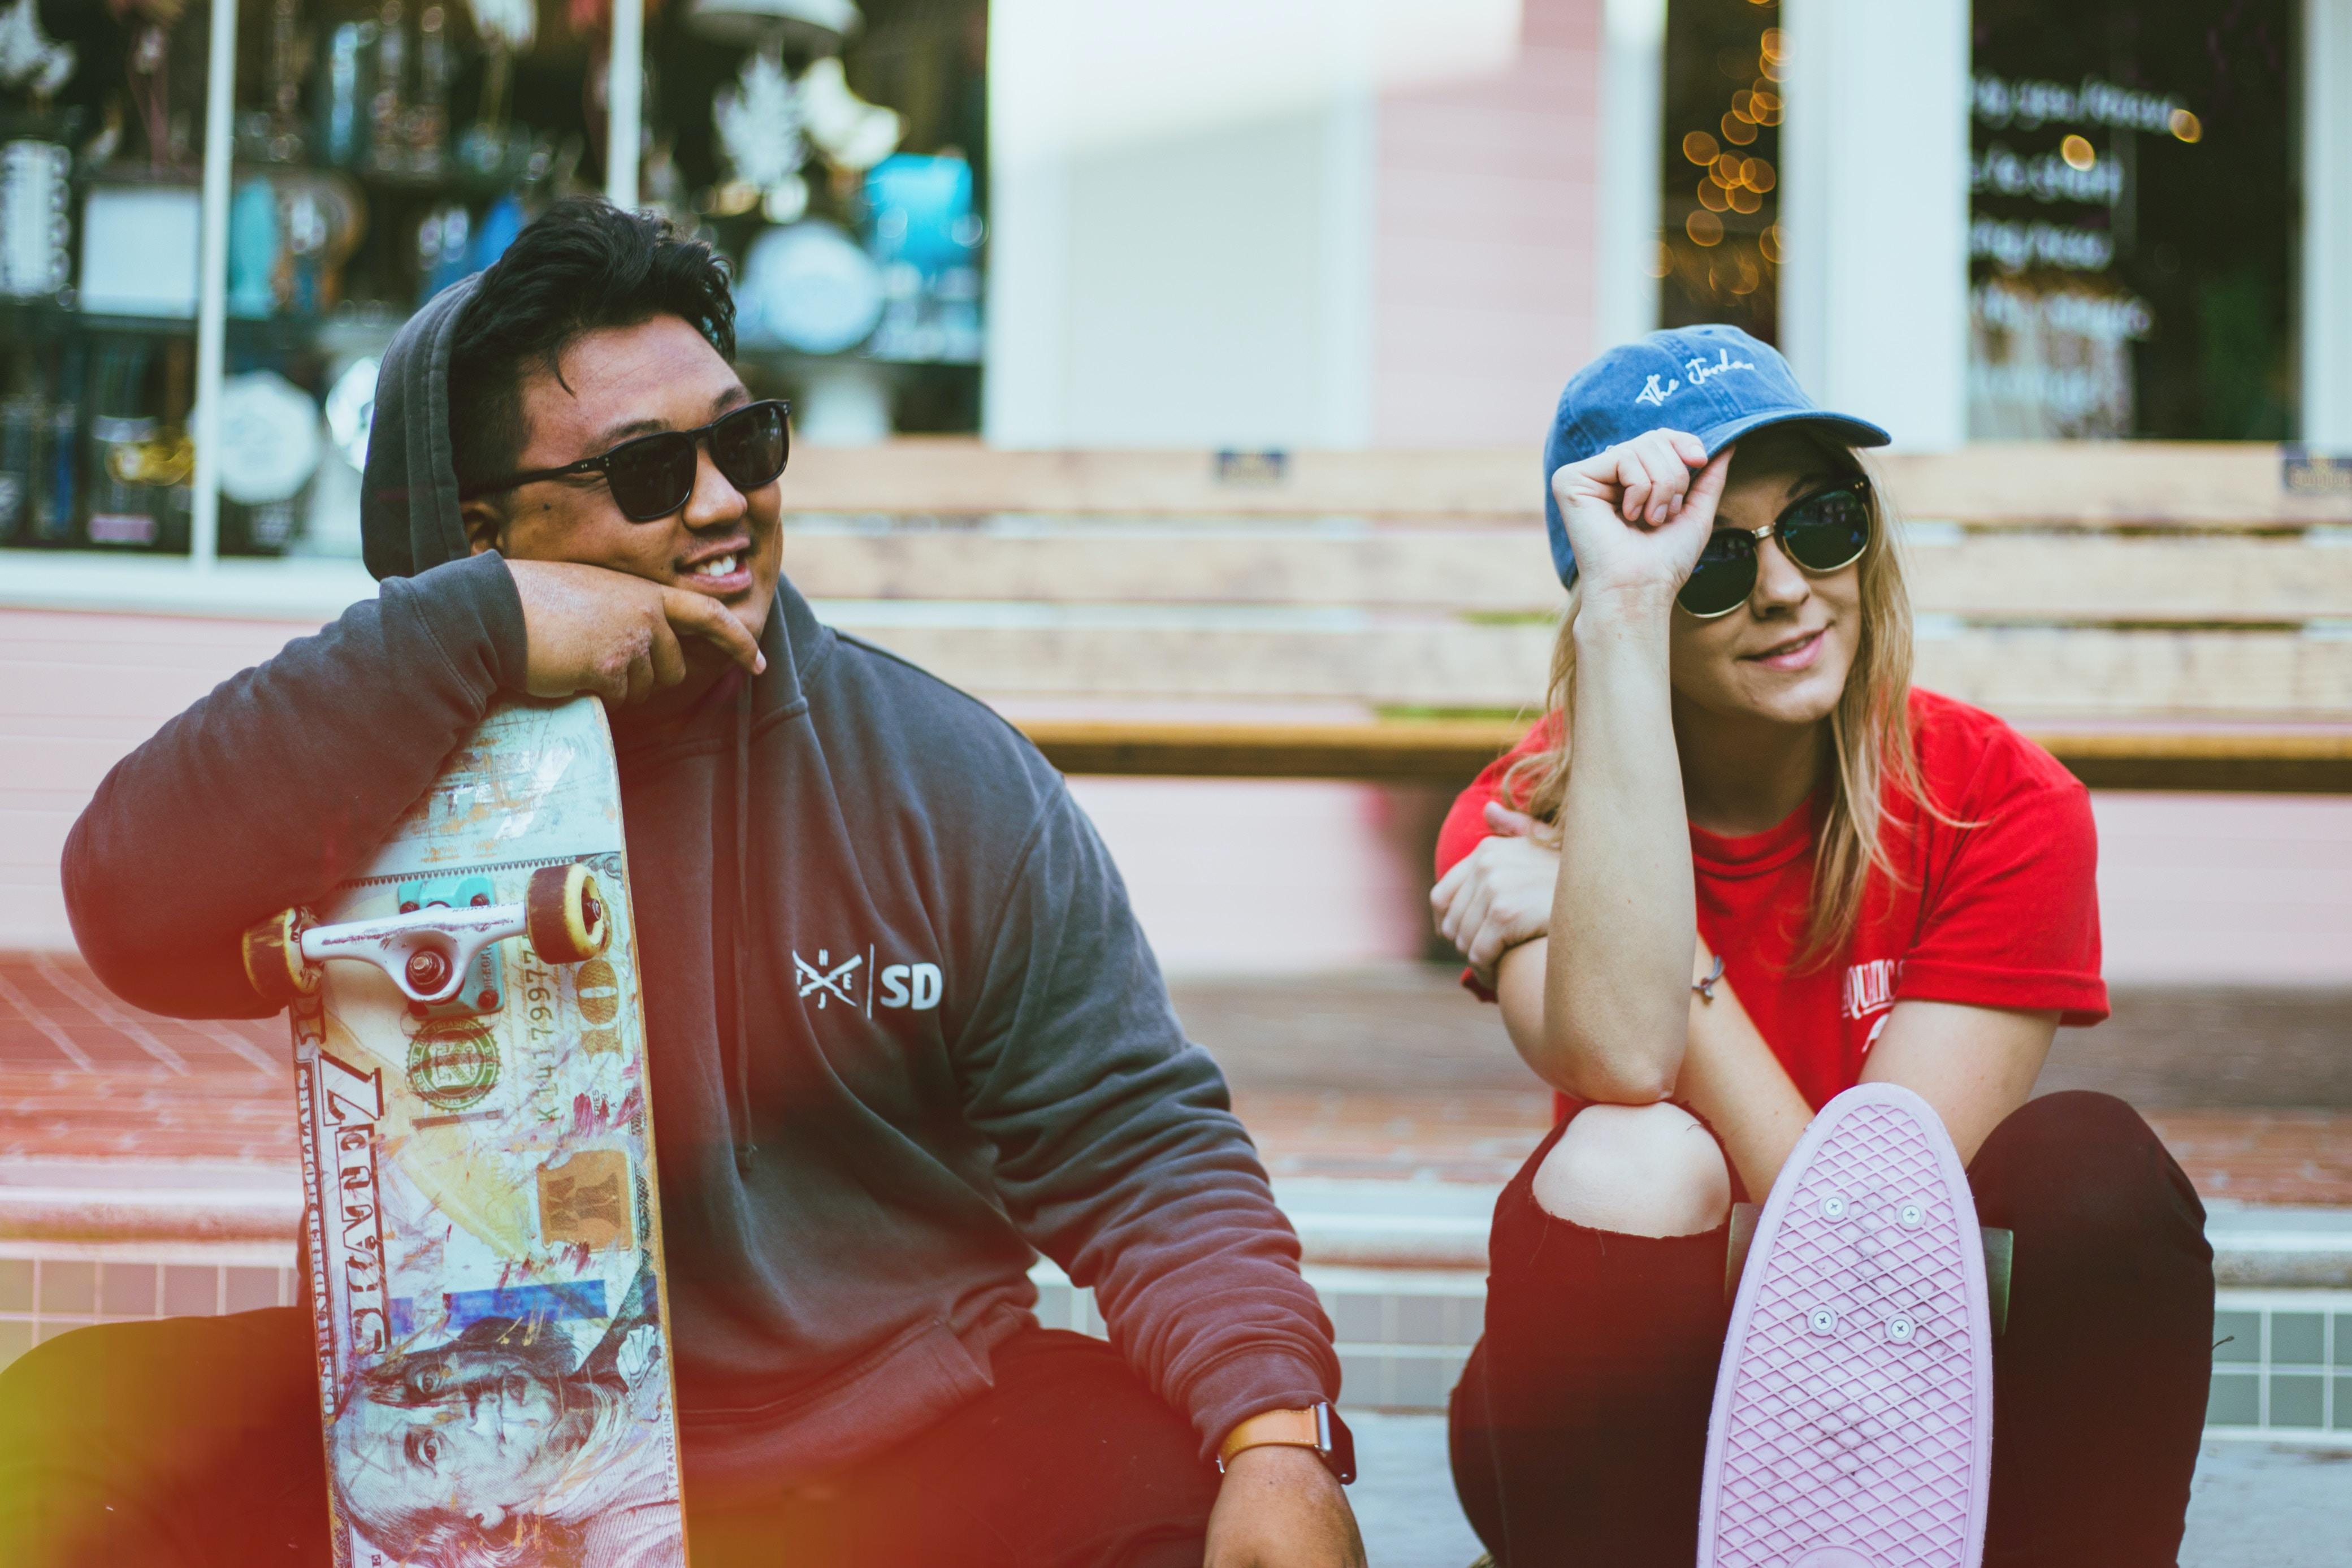 man and woman wearing black sunglasses